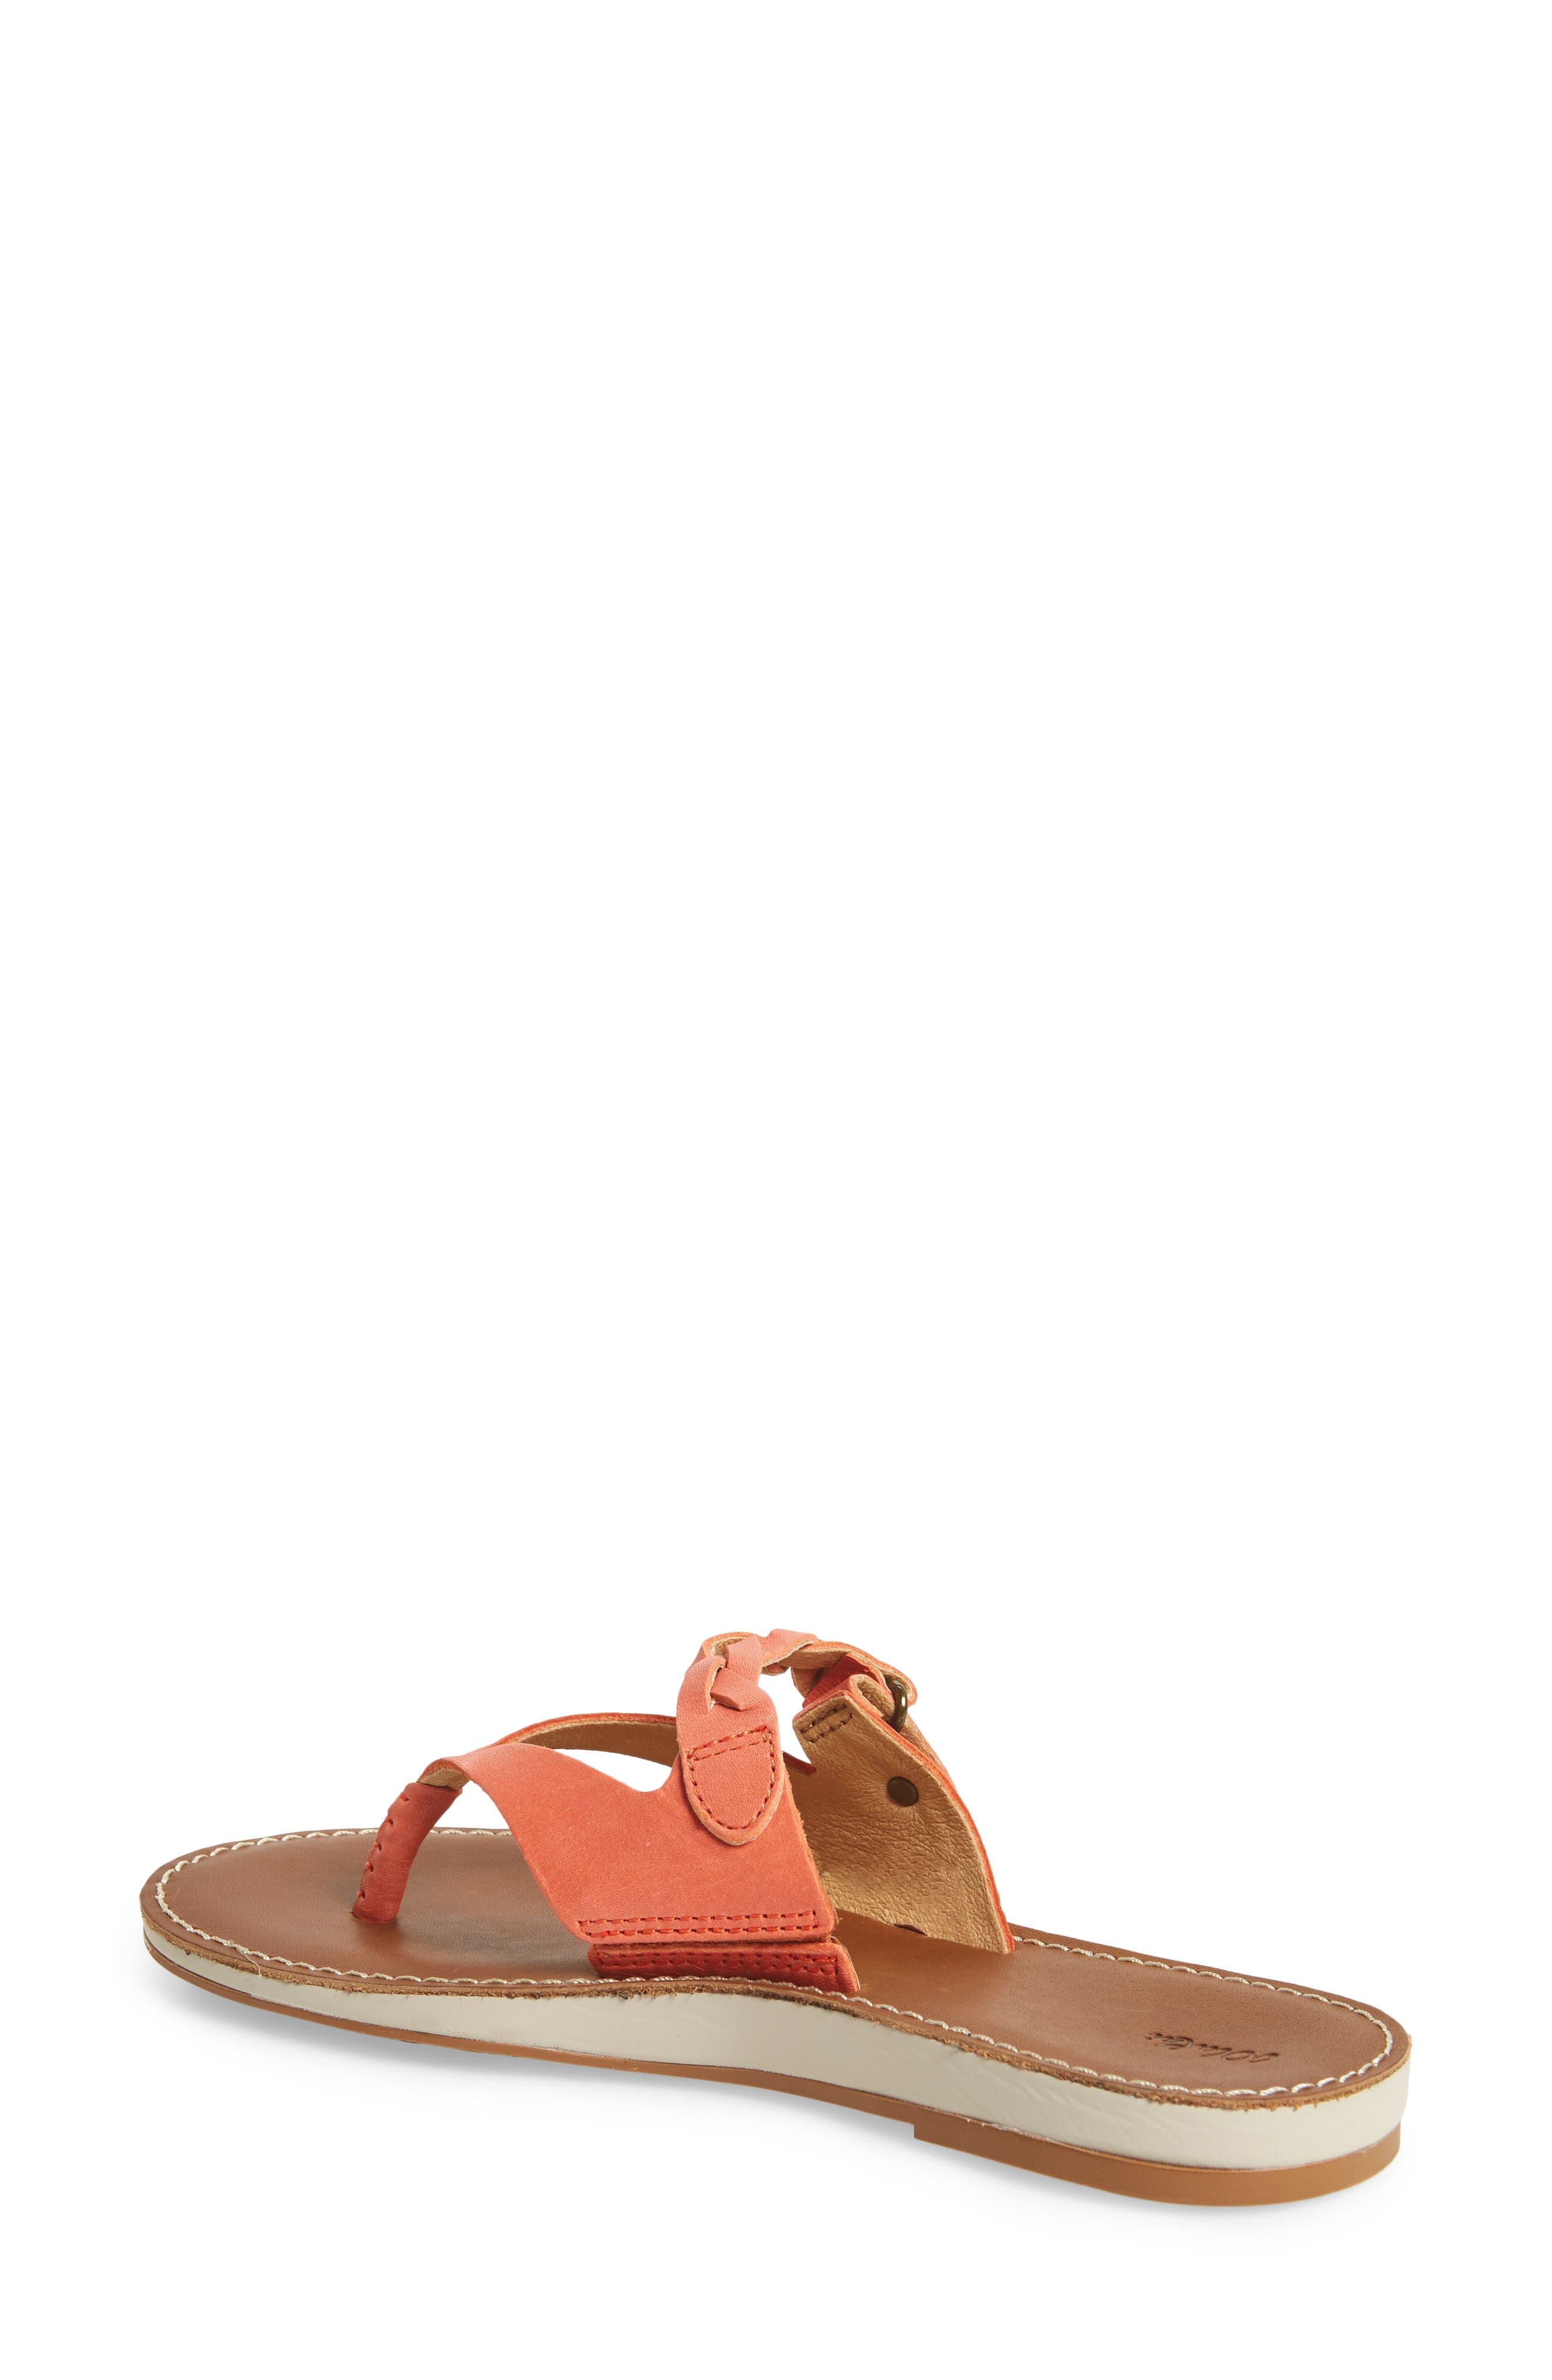 Kahikolu Flip Flop,                             Alternate thumbnail 2, color,                             Peach/ Tan Leather